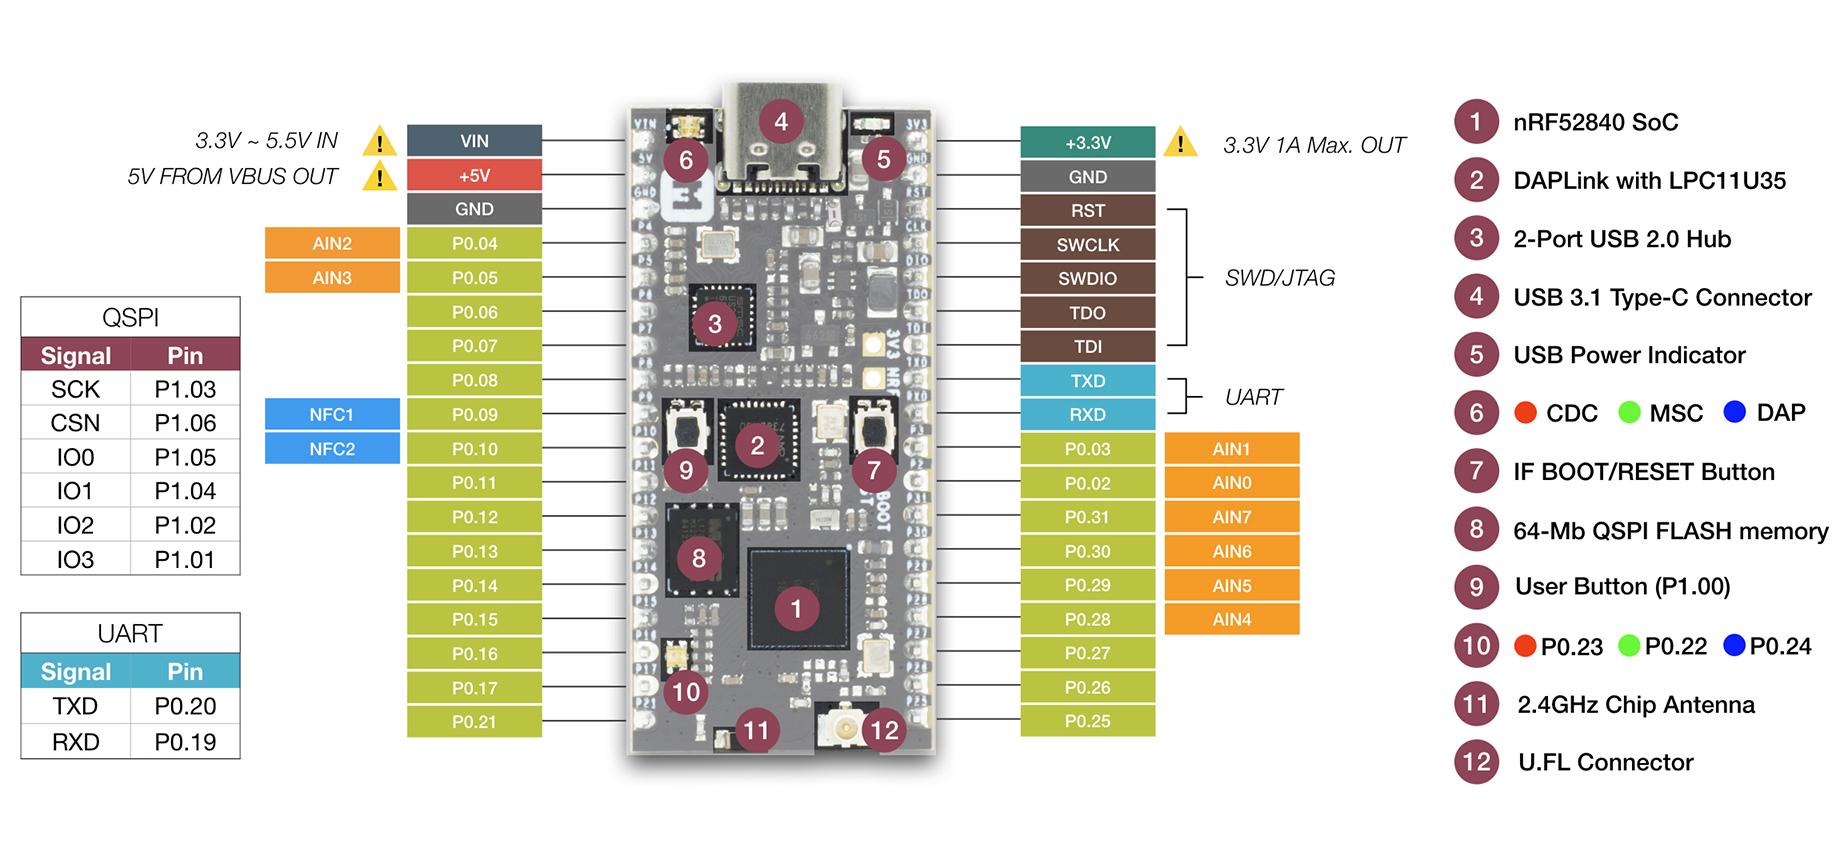 A nRF52840-MDK IoT Development Kit For Bluetooth 5 Applications